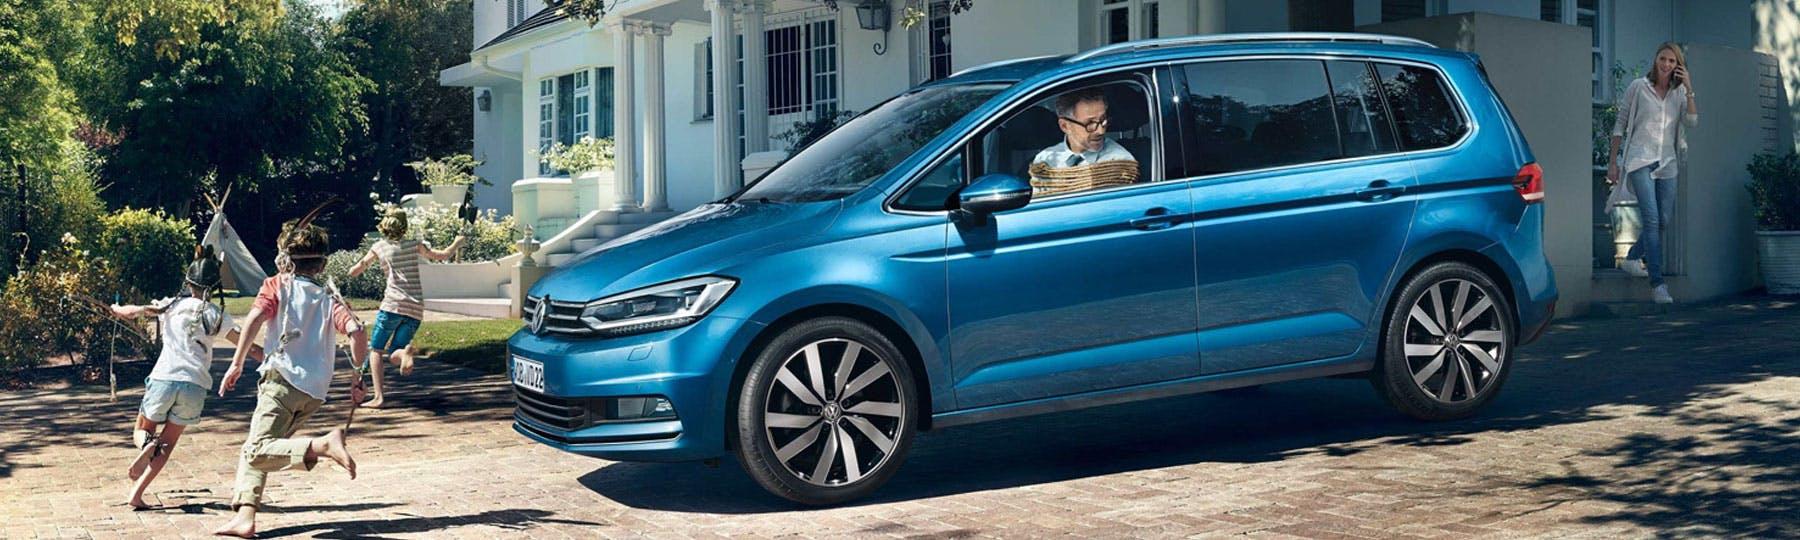 Volkswagen Touran Motability